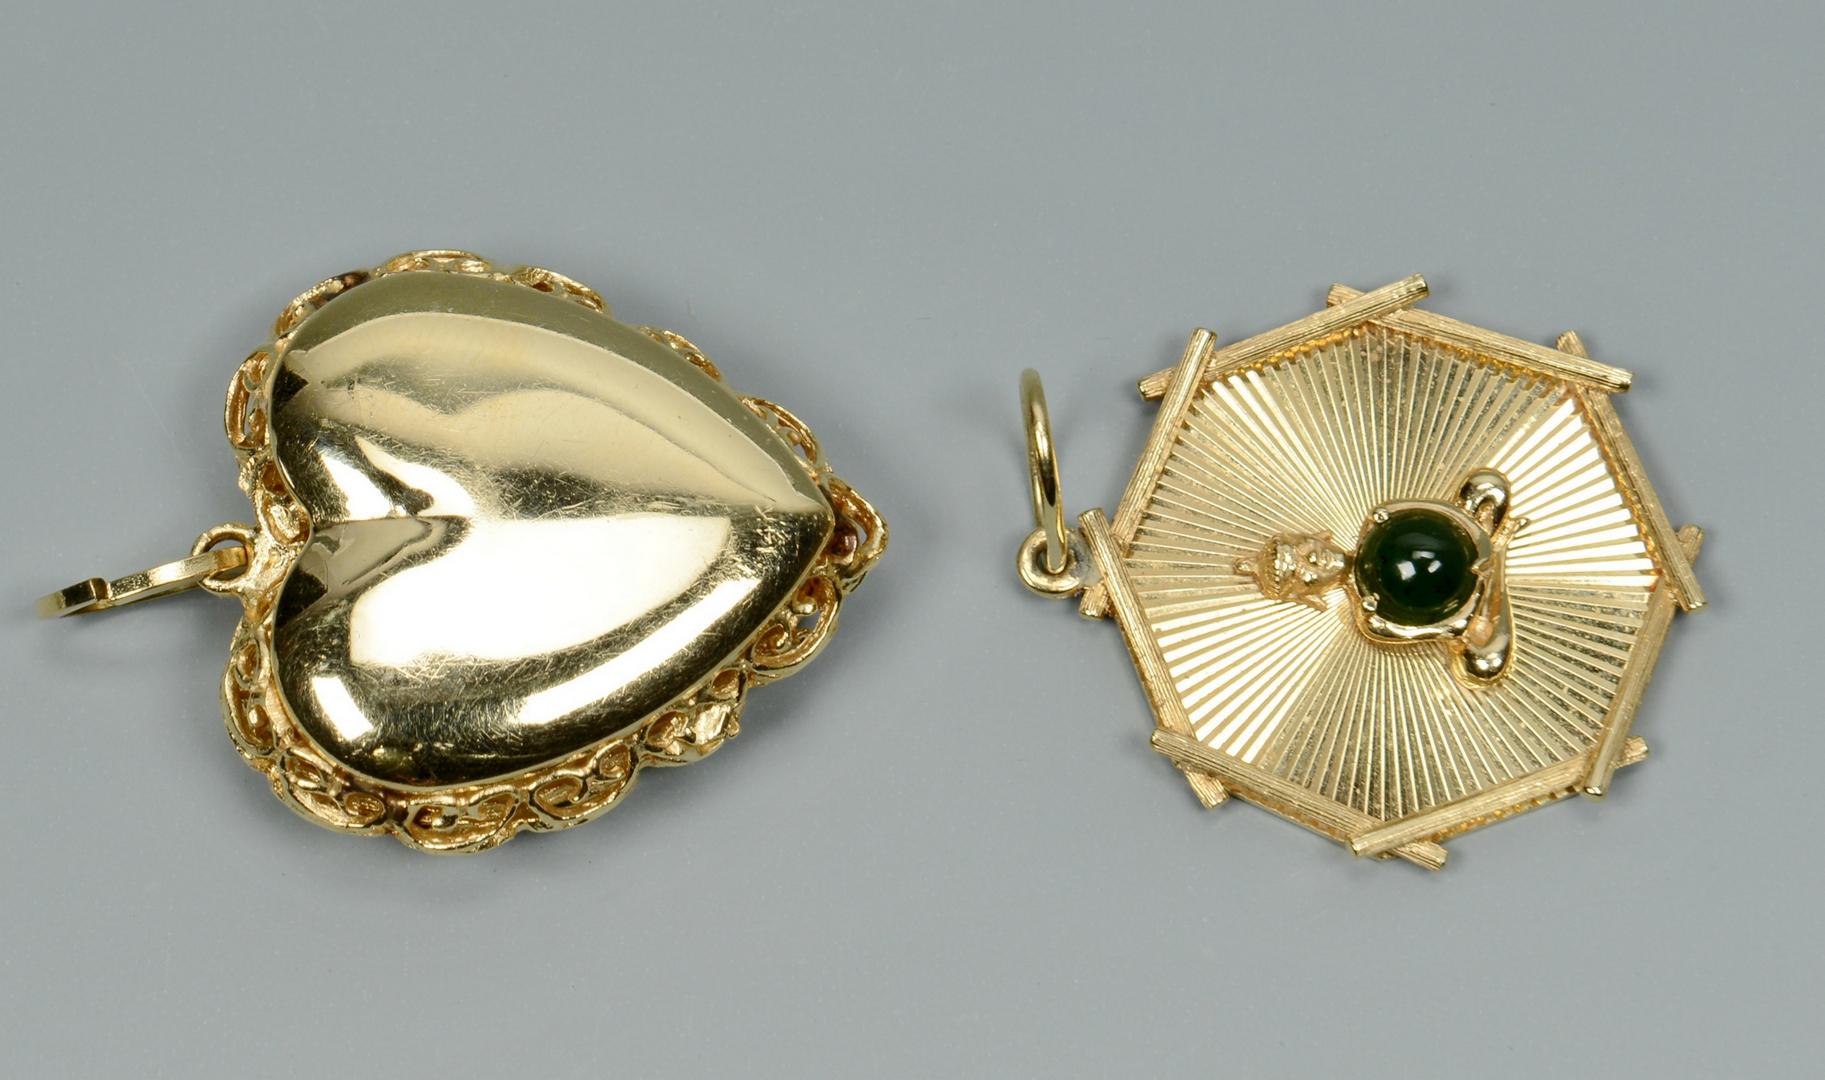 Lot 3088222: Two 14k pendants: Buddha and Puffed Heart